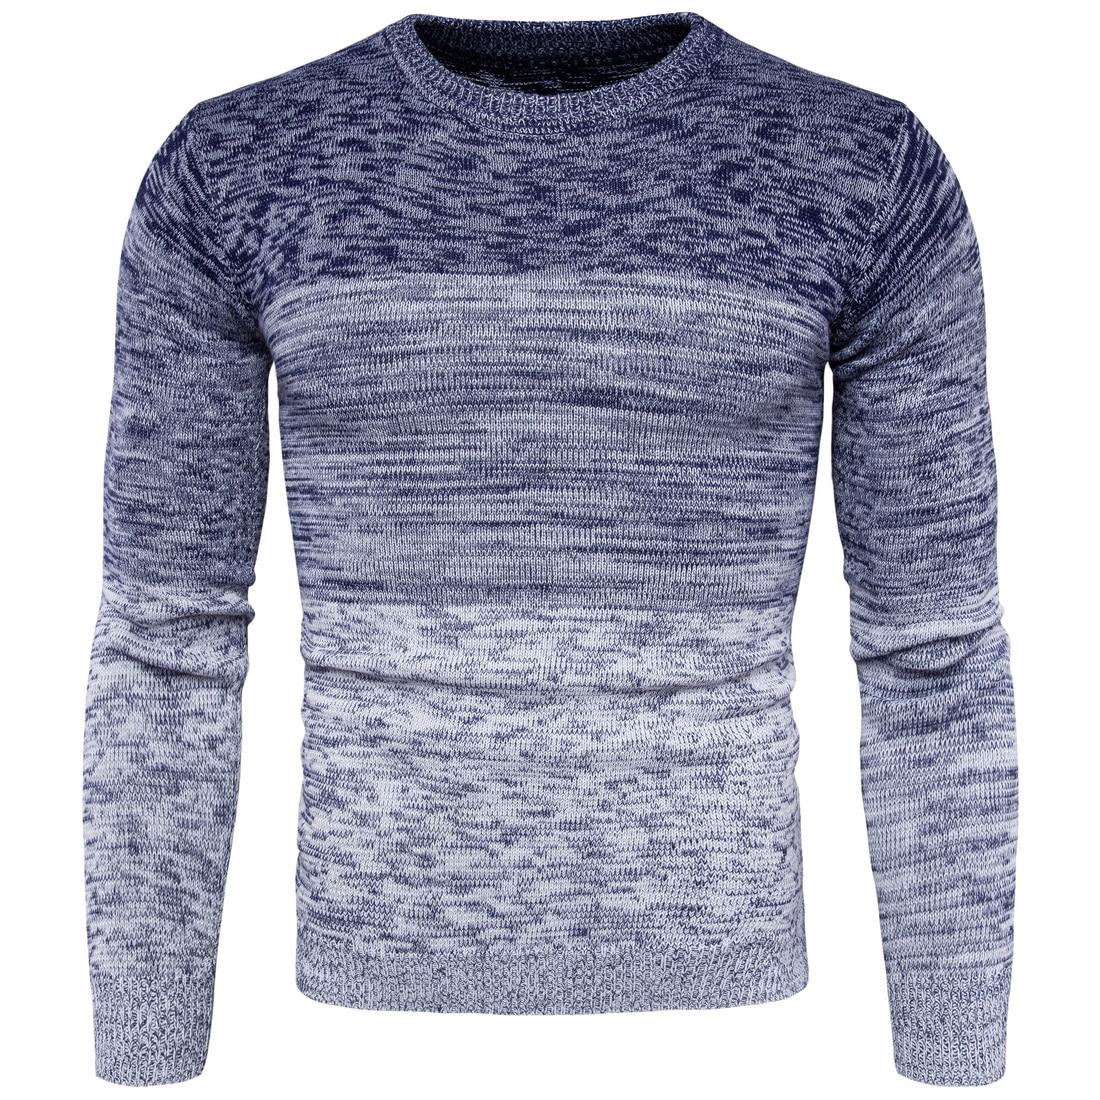 font b Sweater b font Pullover font b Men b font 2017 Male Brand Casual